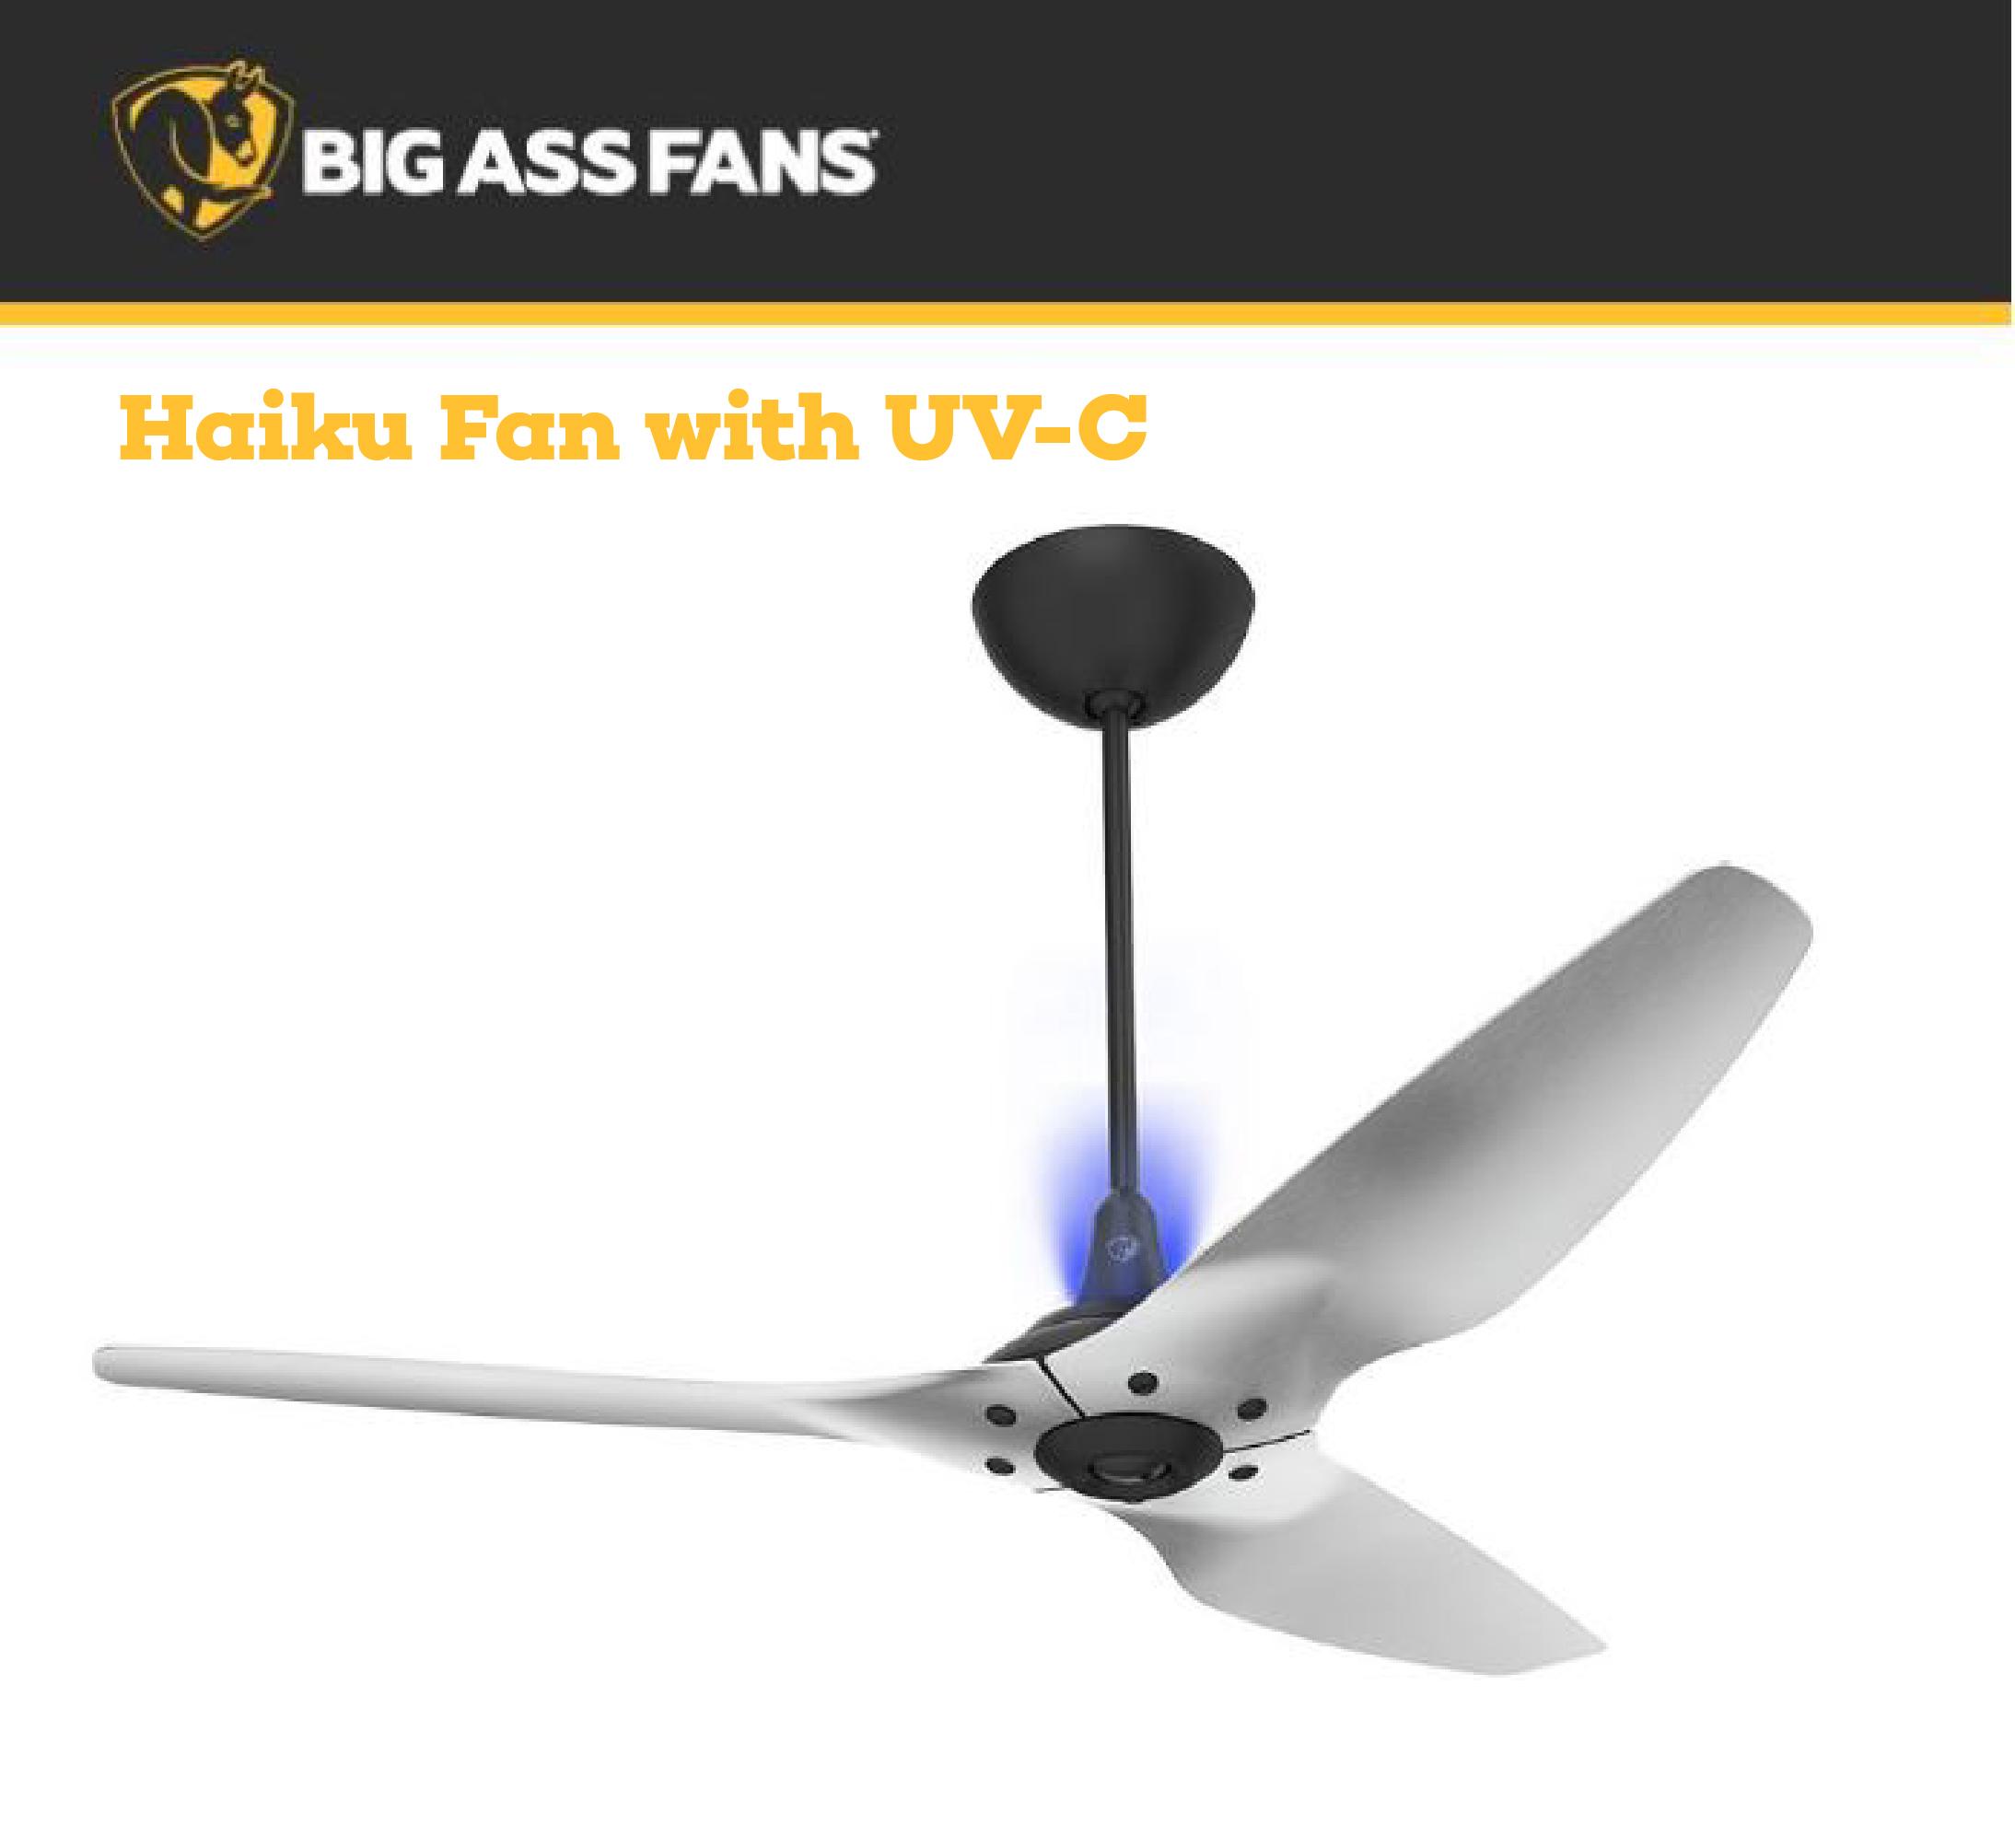 NEW PRODUCT ANNOUNCEMENT |     Big Ass Fans | Haiku Fan with UV-C